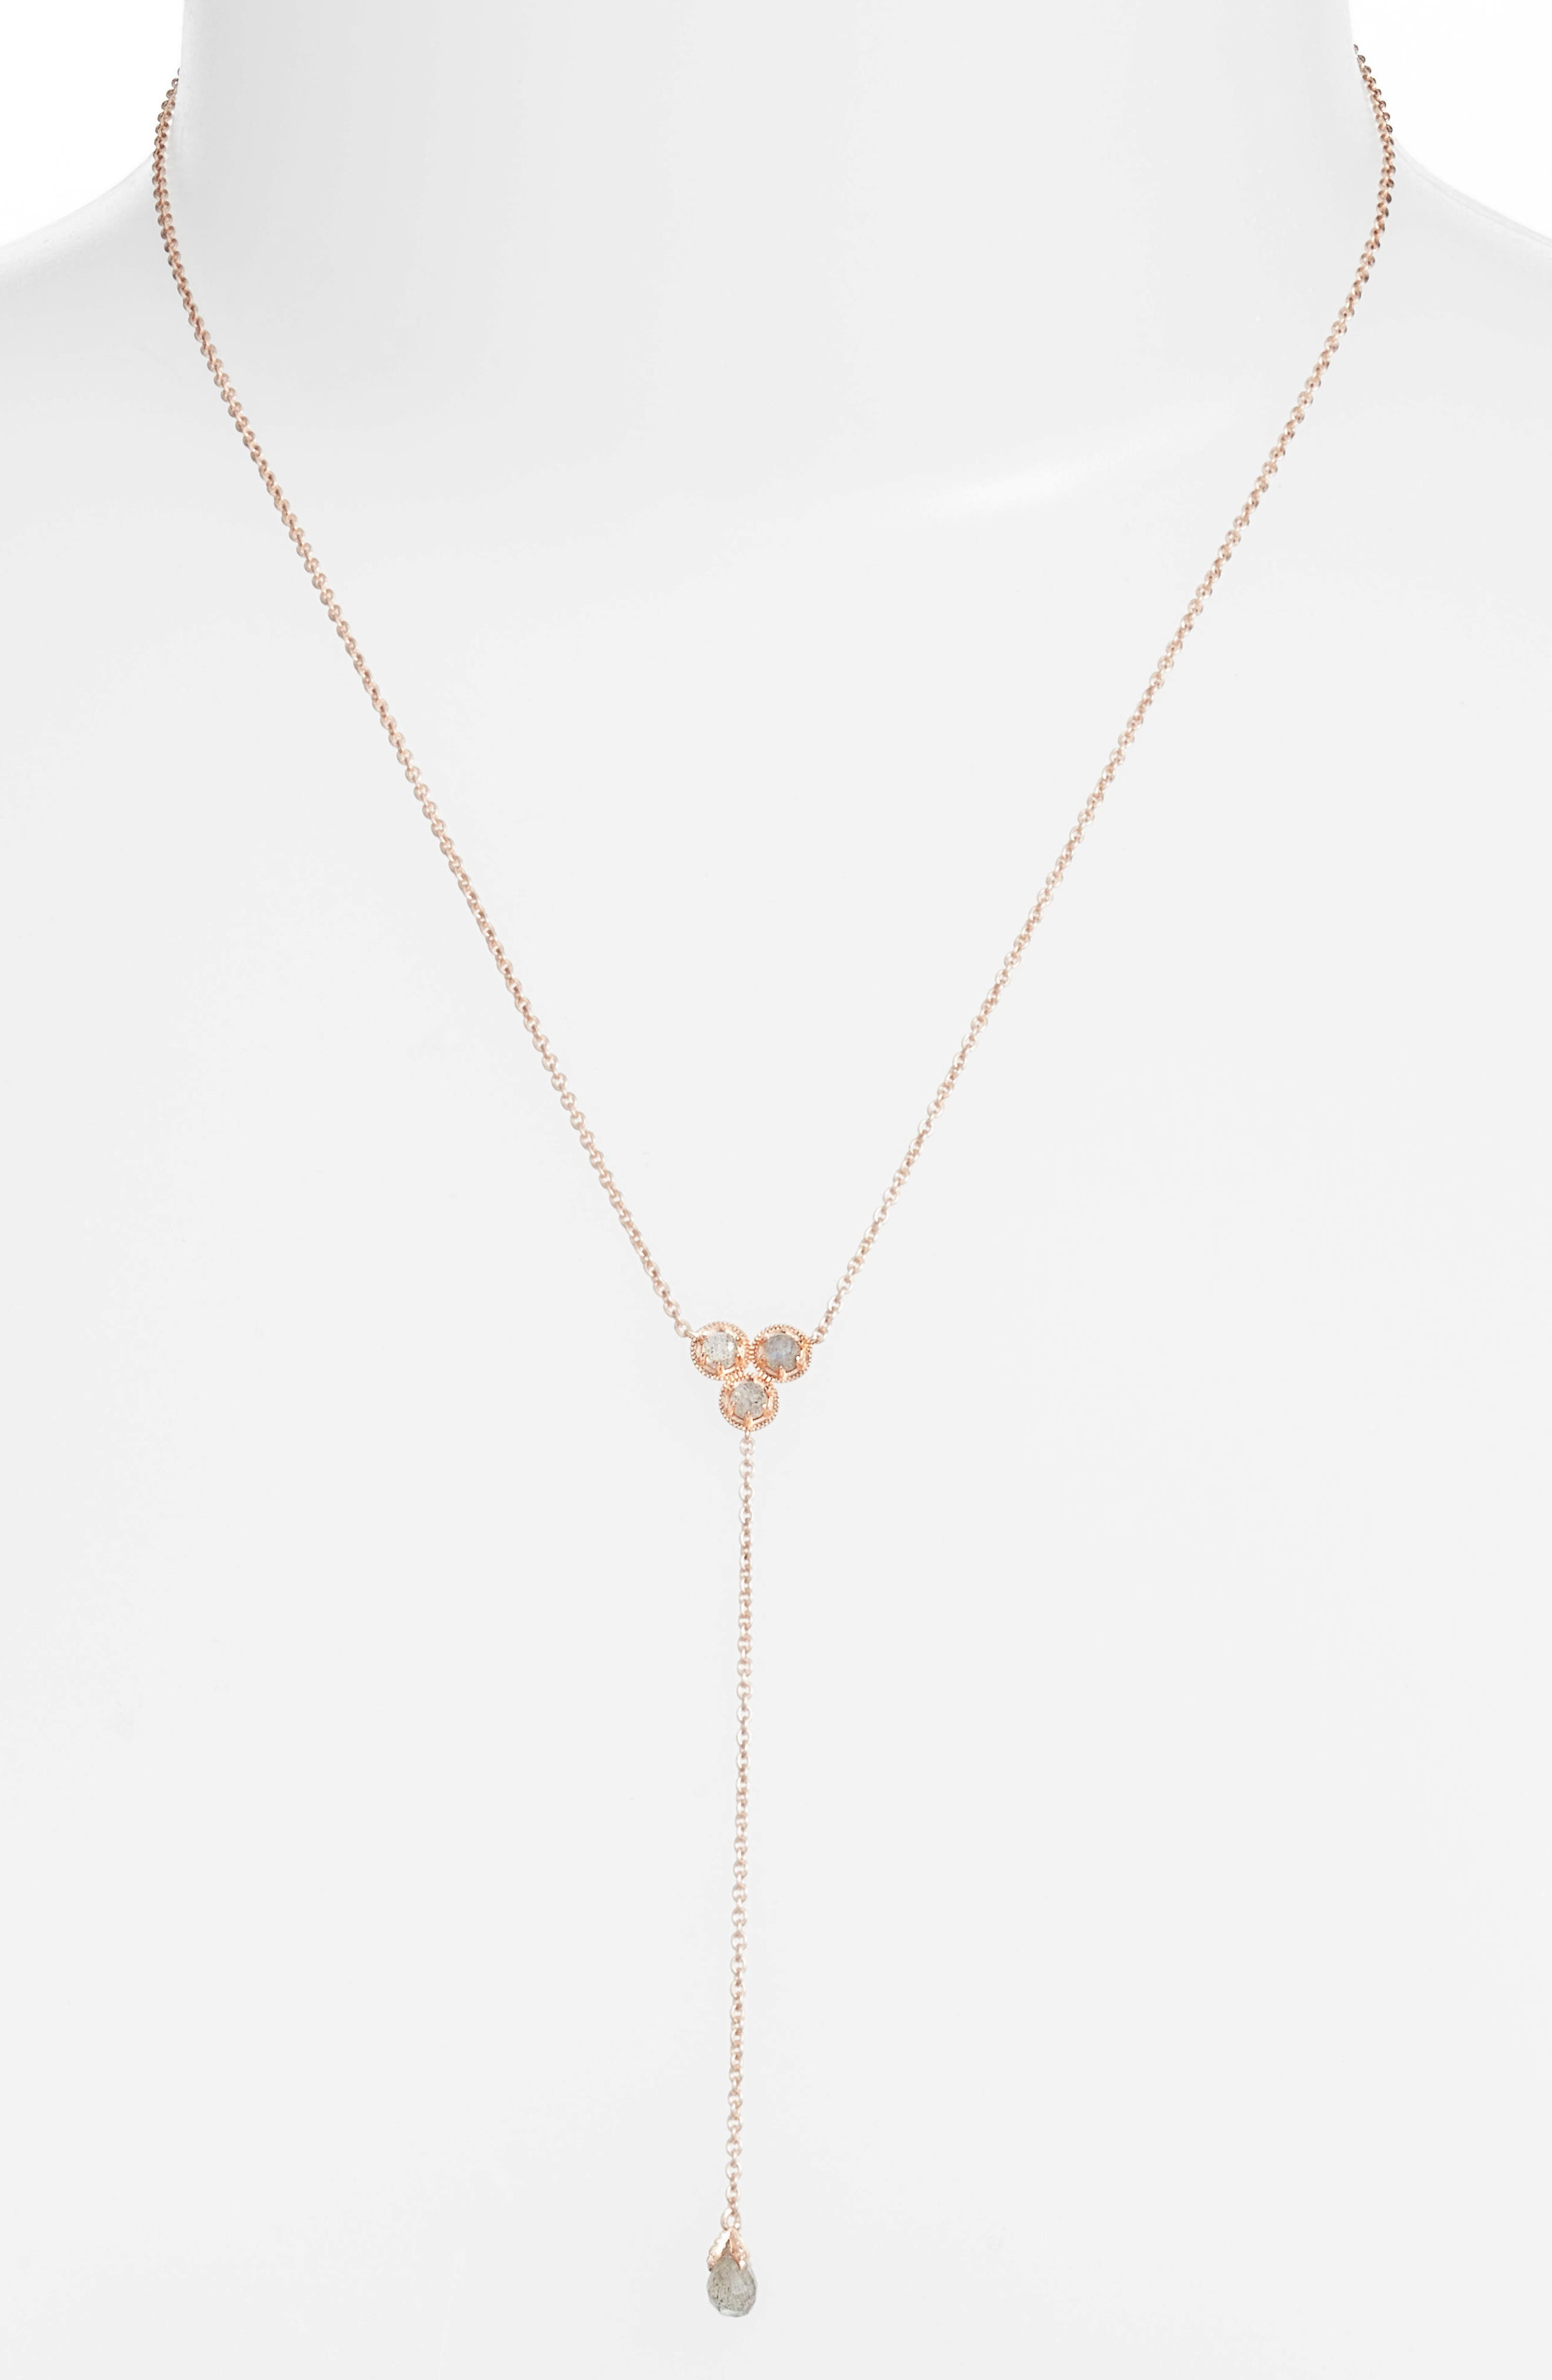 Main Image - Nadri Cleo Semiprecious Stone Necklace